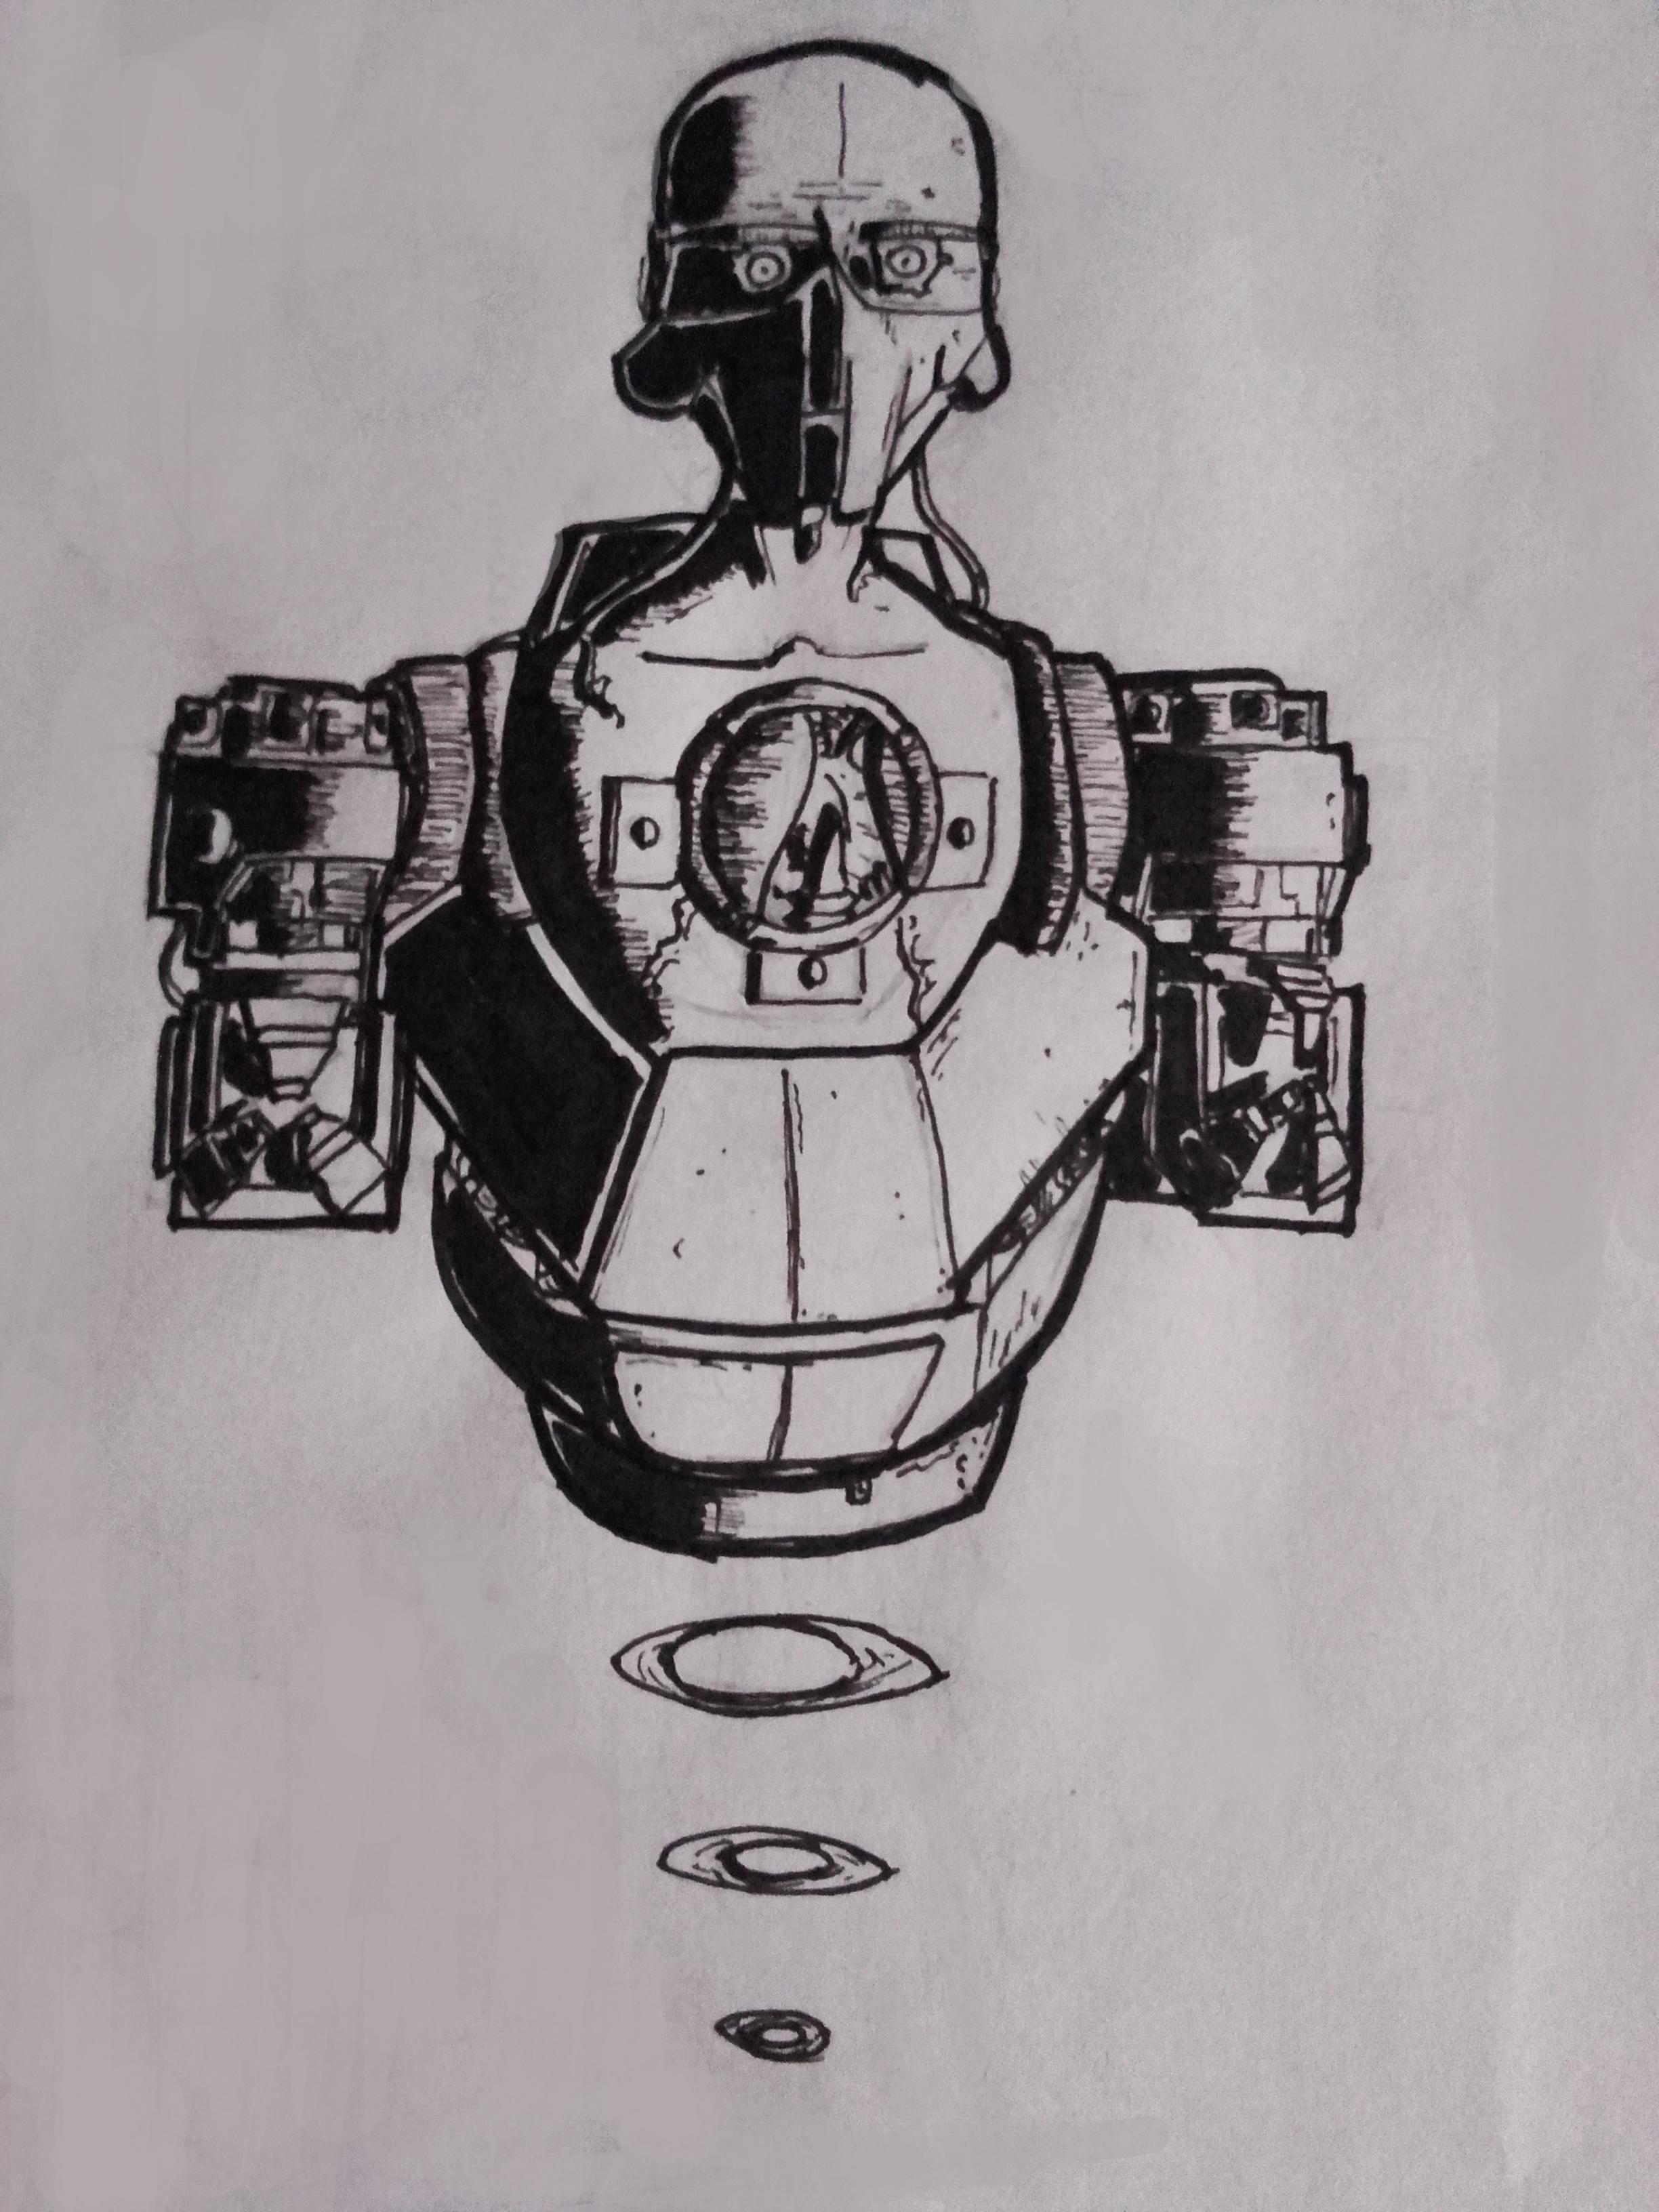 Cyborg concept art